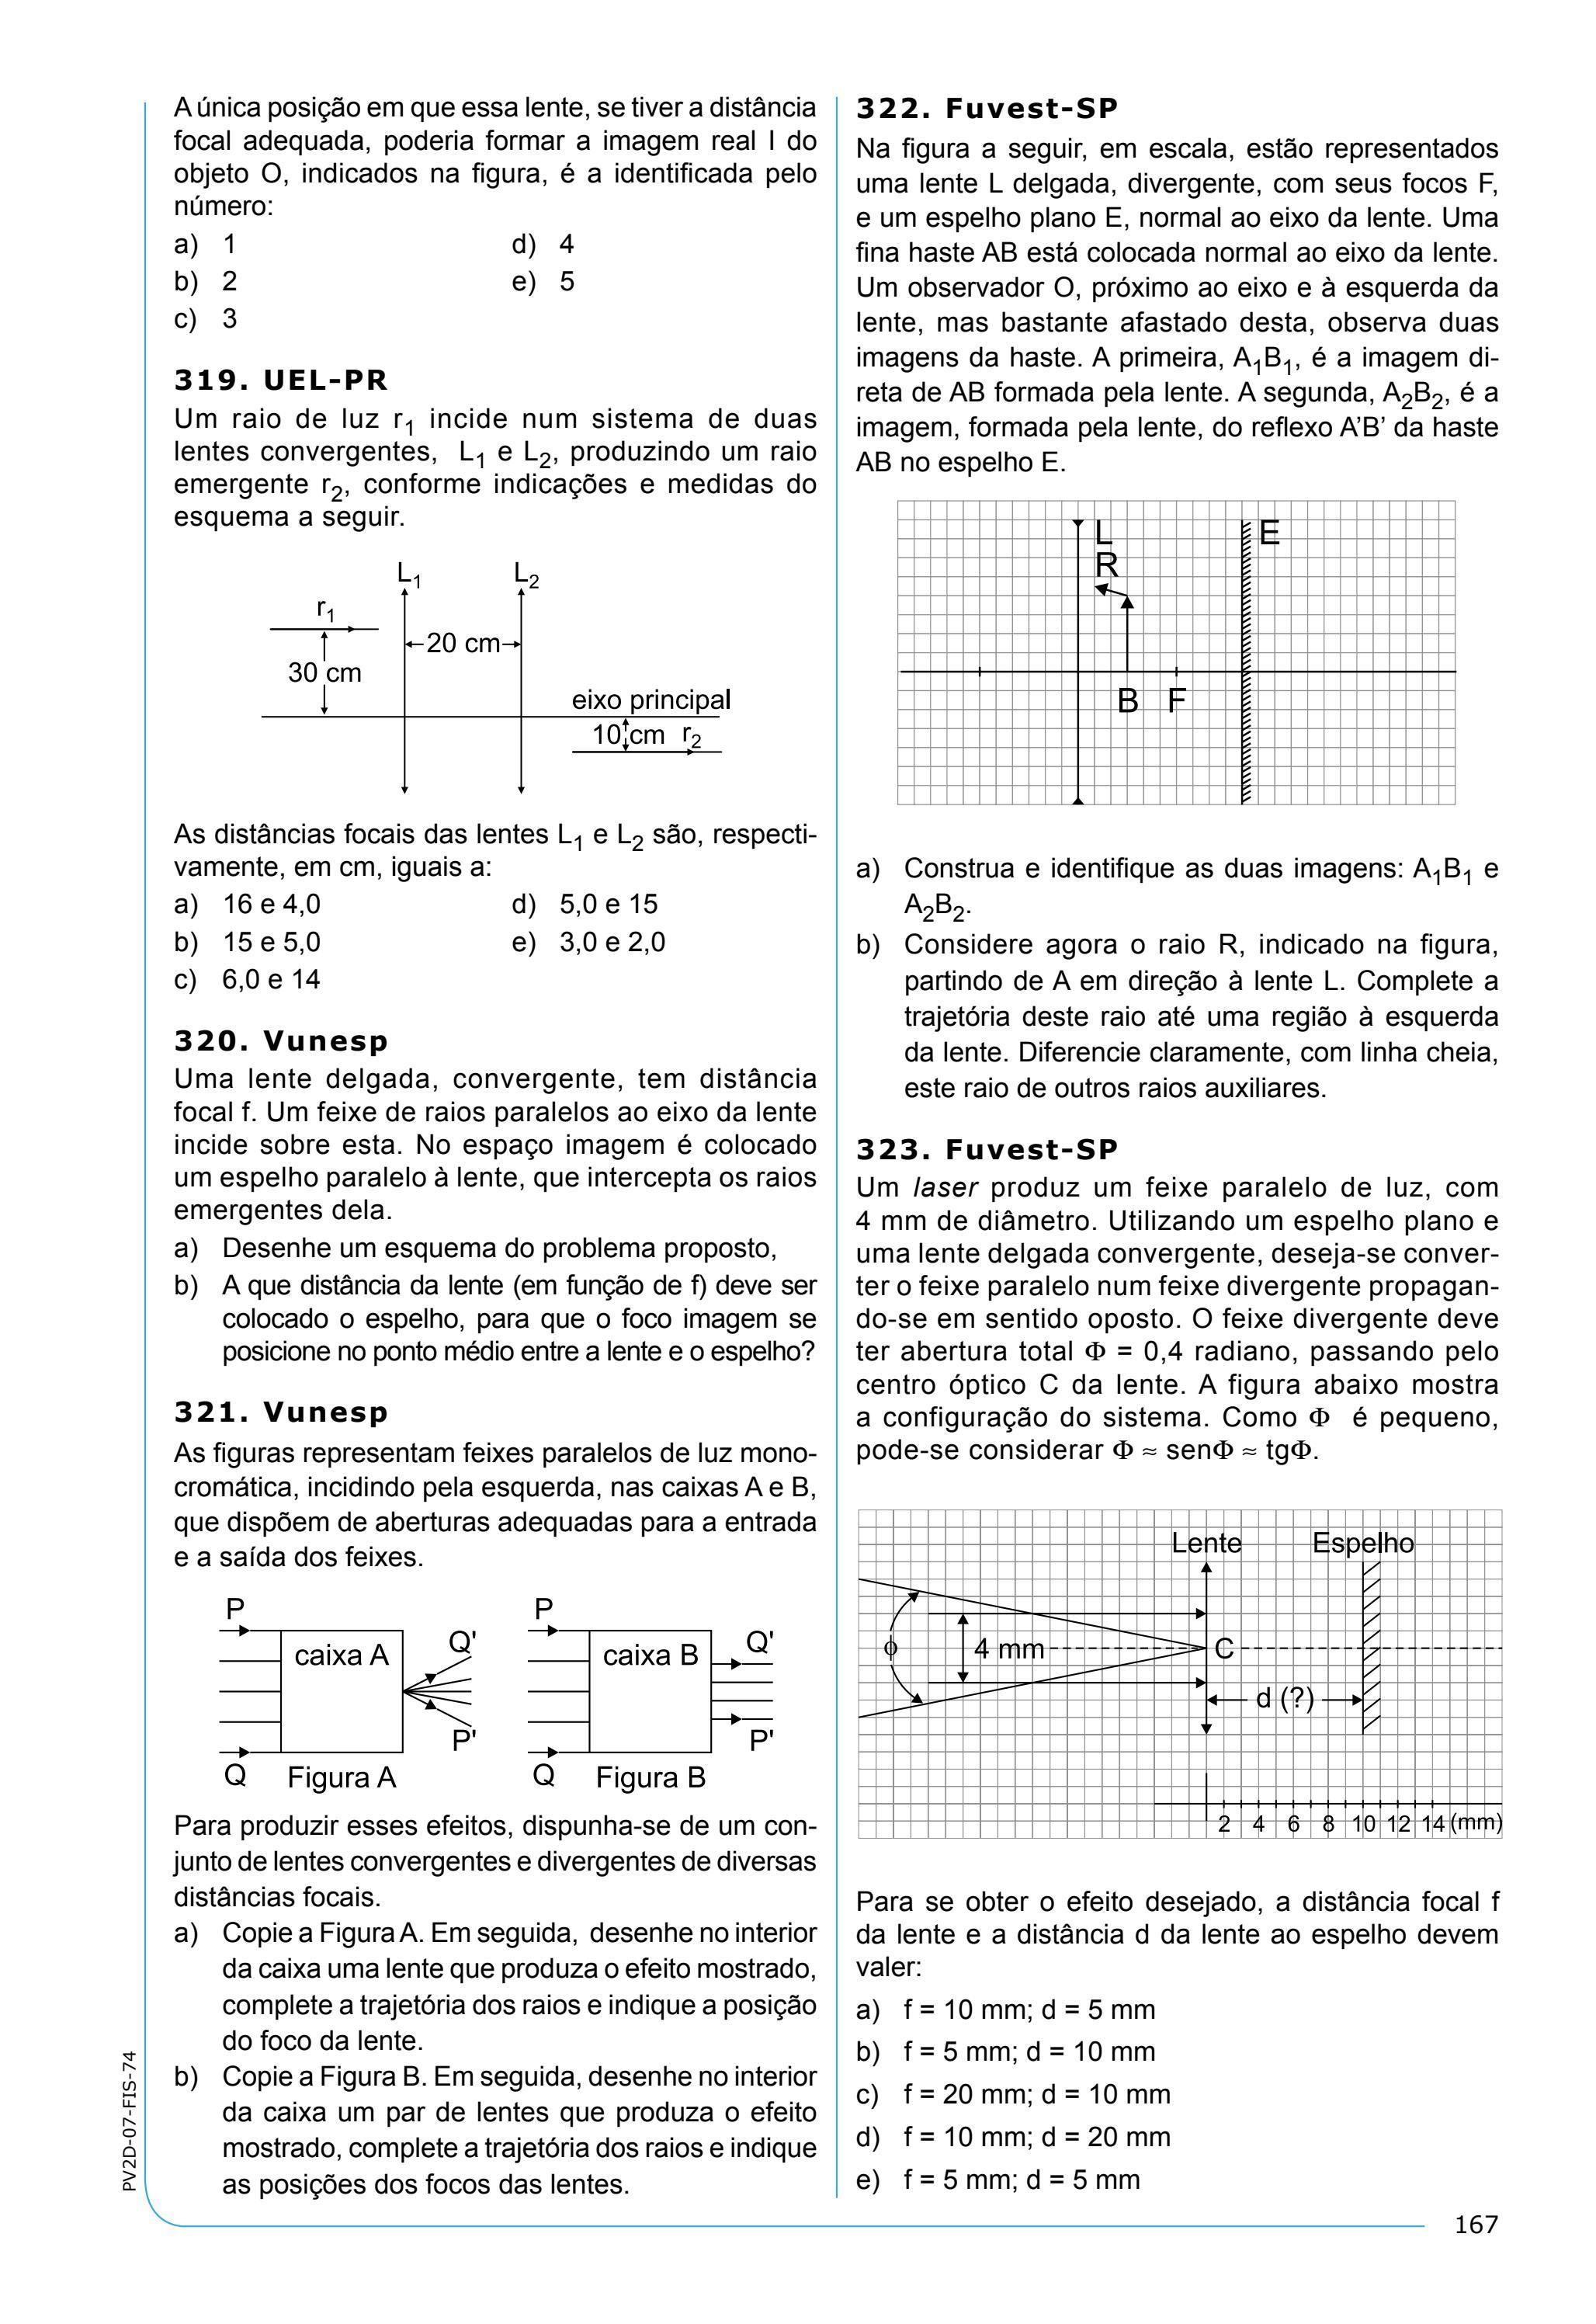 55ca718d2b456 Fis07 livro propostos by leonardo fonseca - issuu